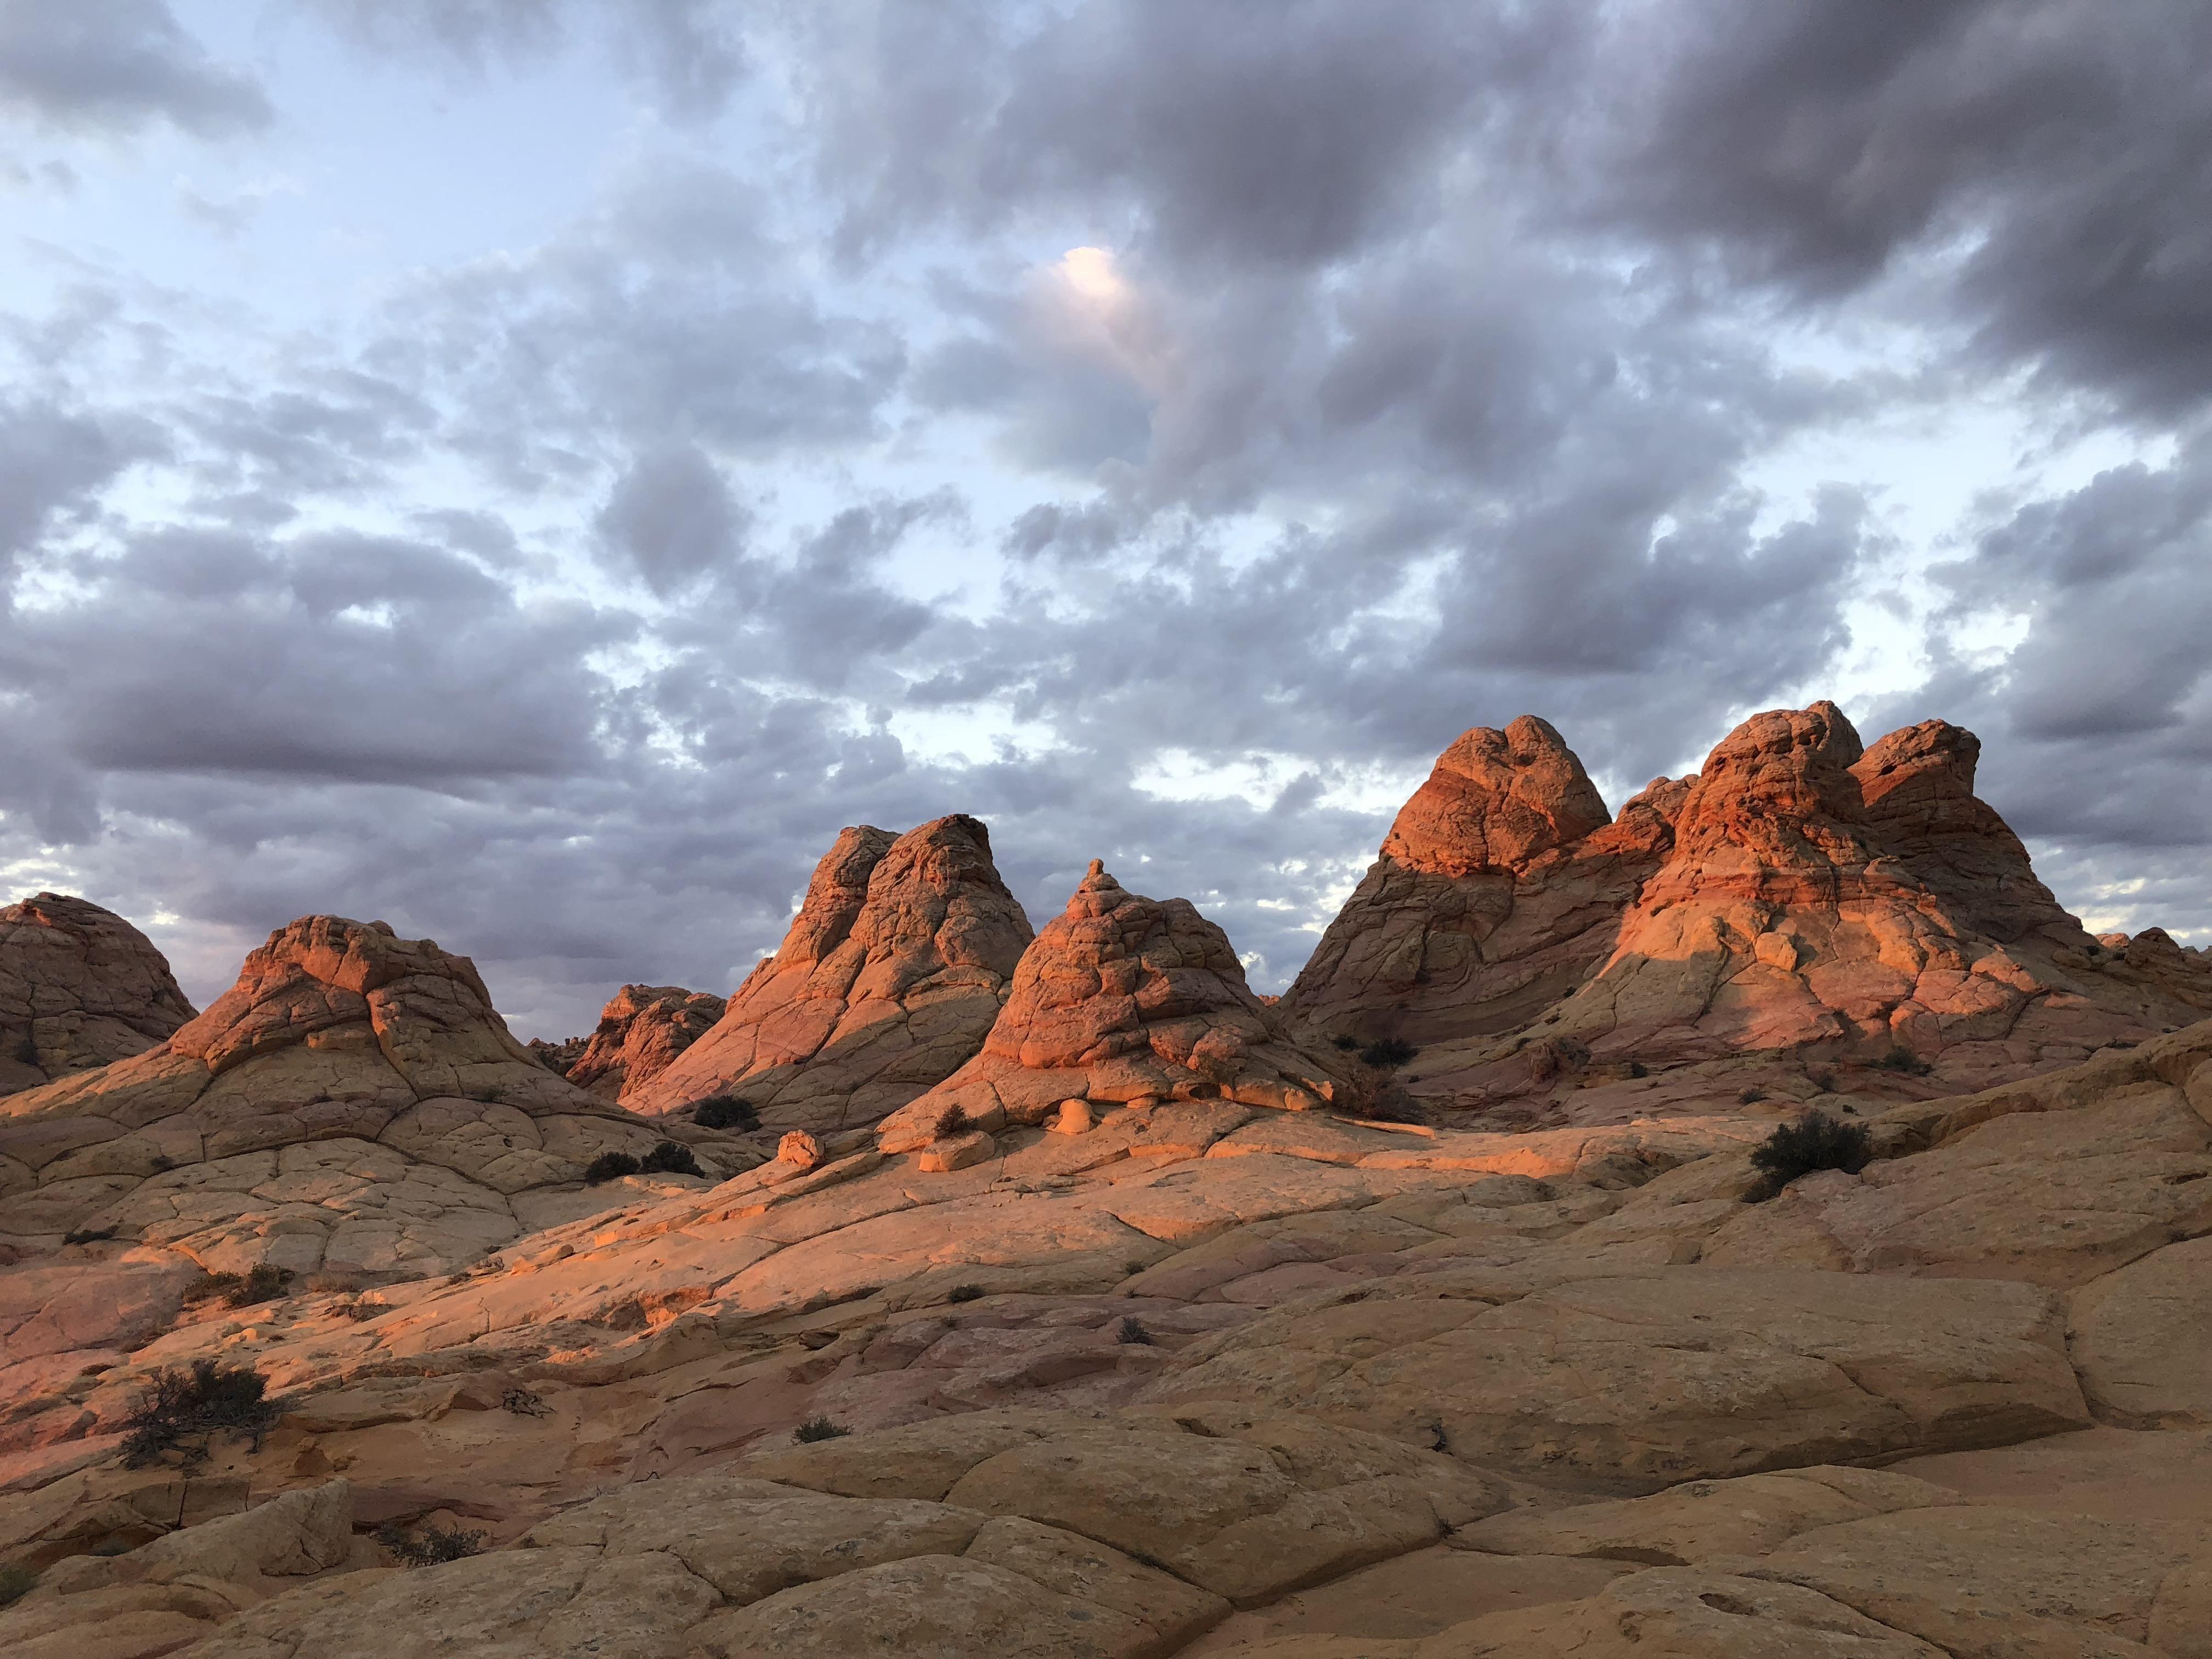 Sunrise Vermillion Cliffs National Monument Arizona 2018 09 23 Unedited Oc 3272x2304 Https Ift Tt National Monuments Monument Valley Natural Landmarks